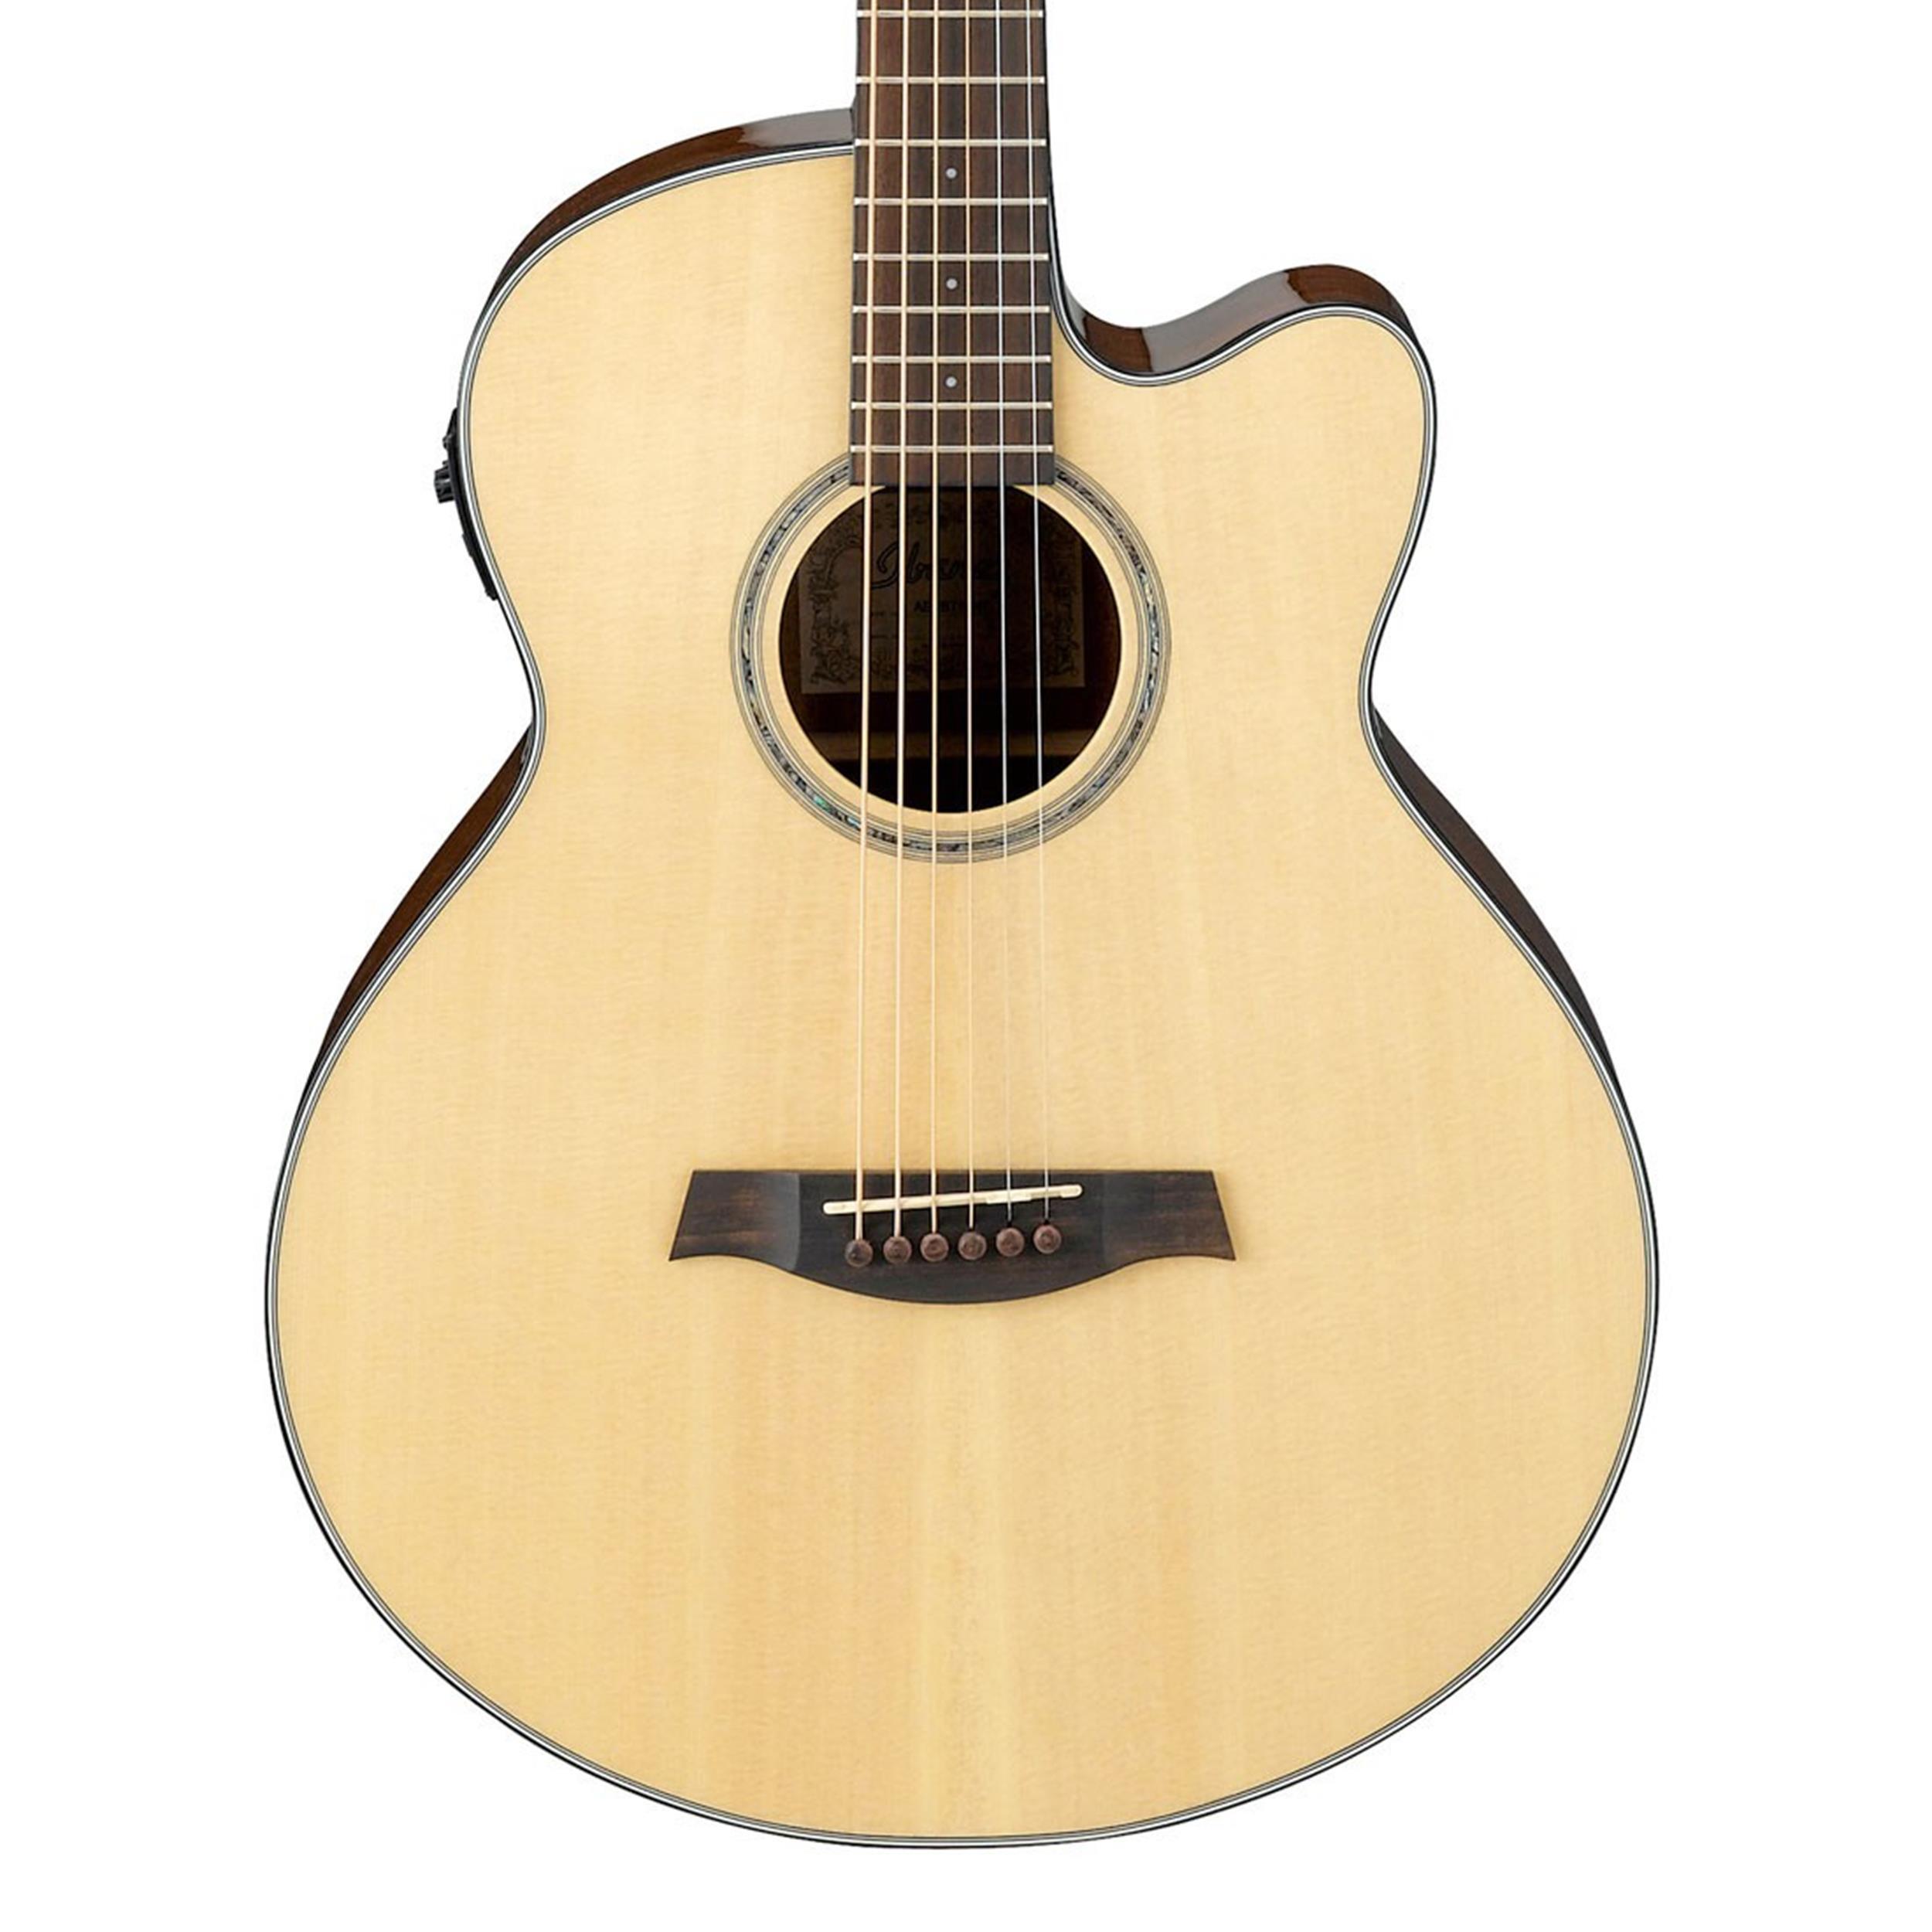 IBANEZ-AELBT1-NT-chitarra-acustica-baritona-Natural-sku-13225